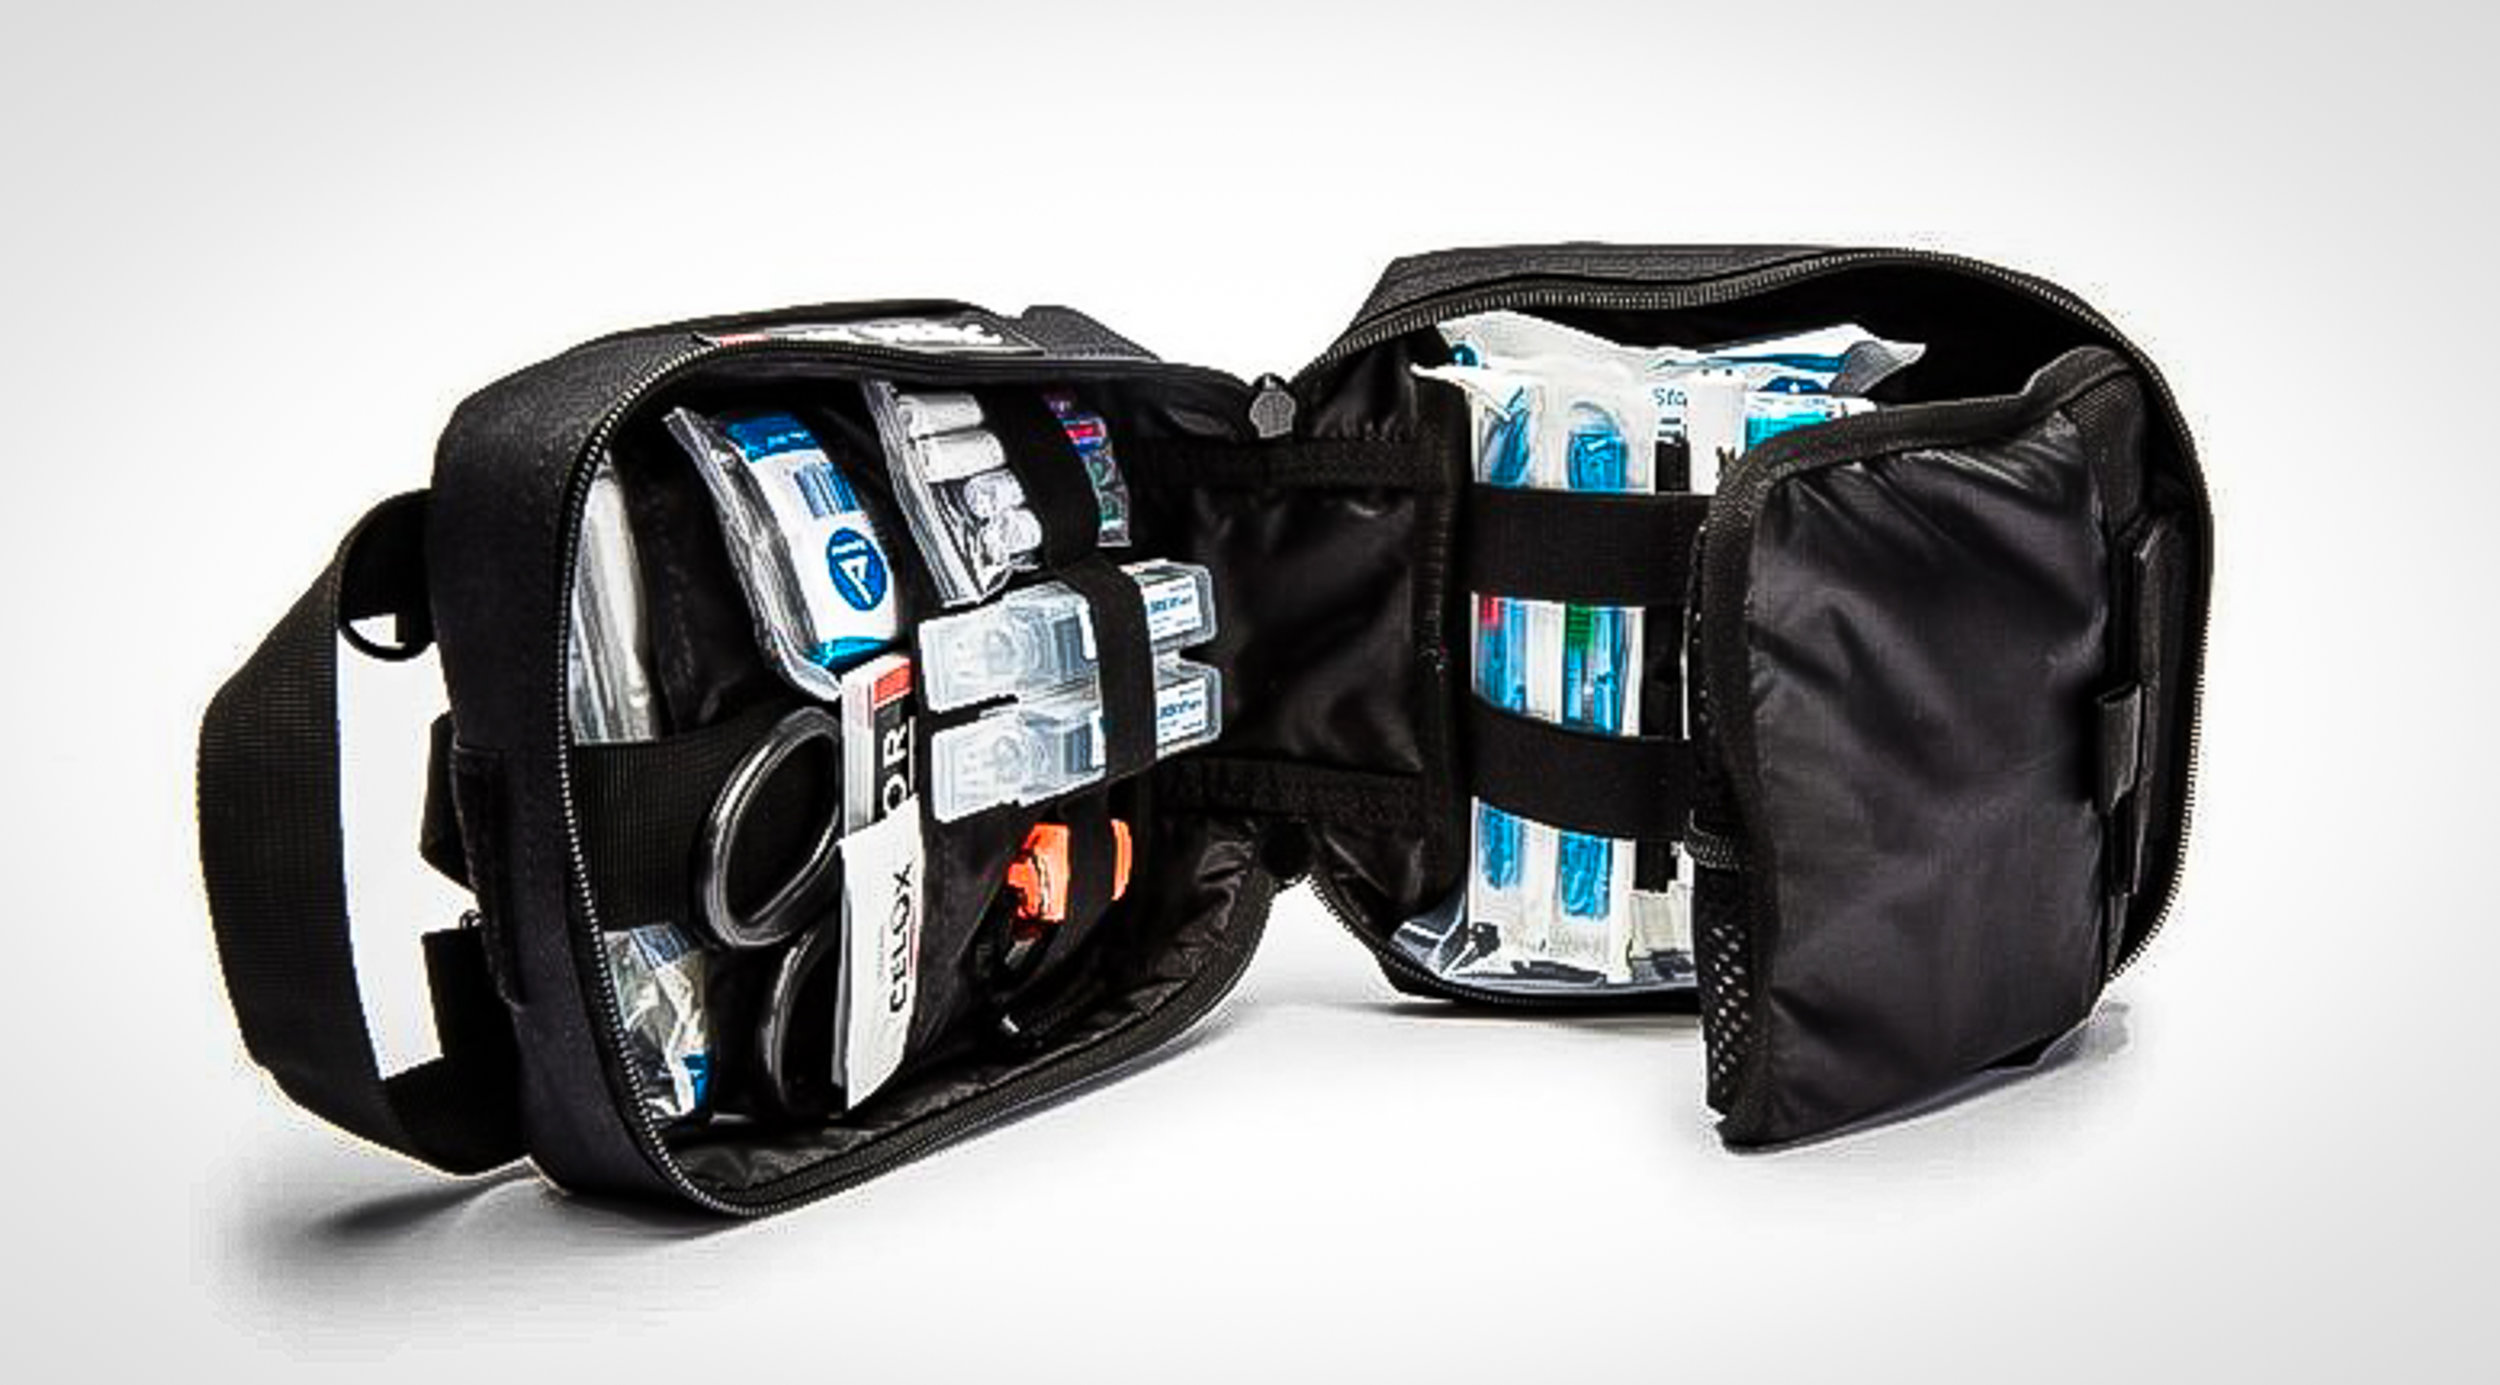 myfak-mymedic-first-aid-backpack-kit.jpg.778x431_q85_crop-smart.jpg